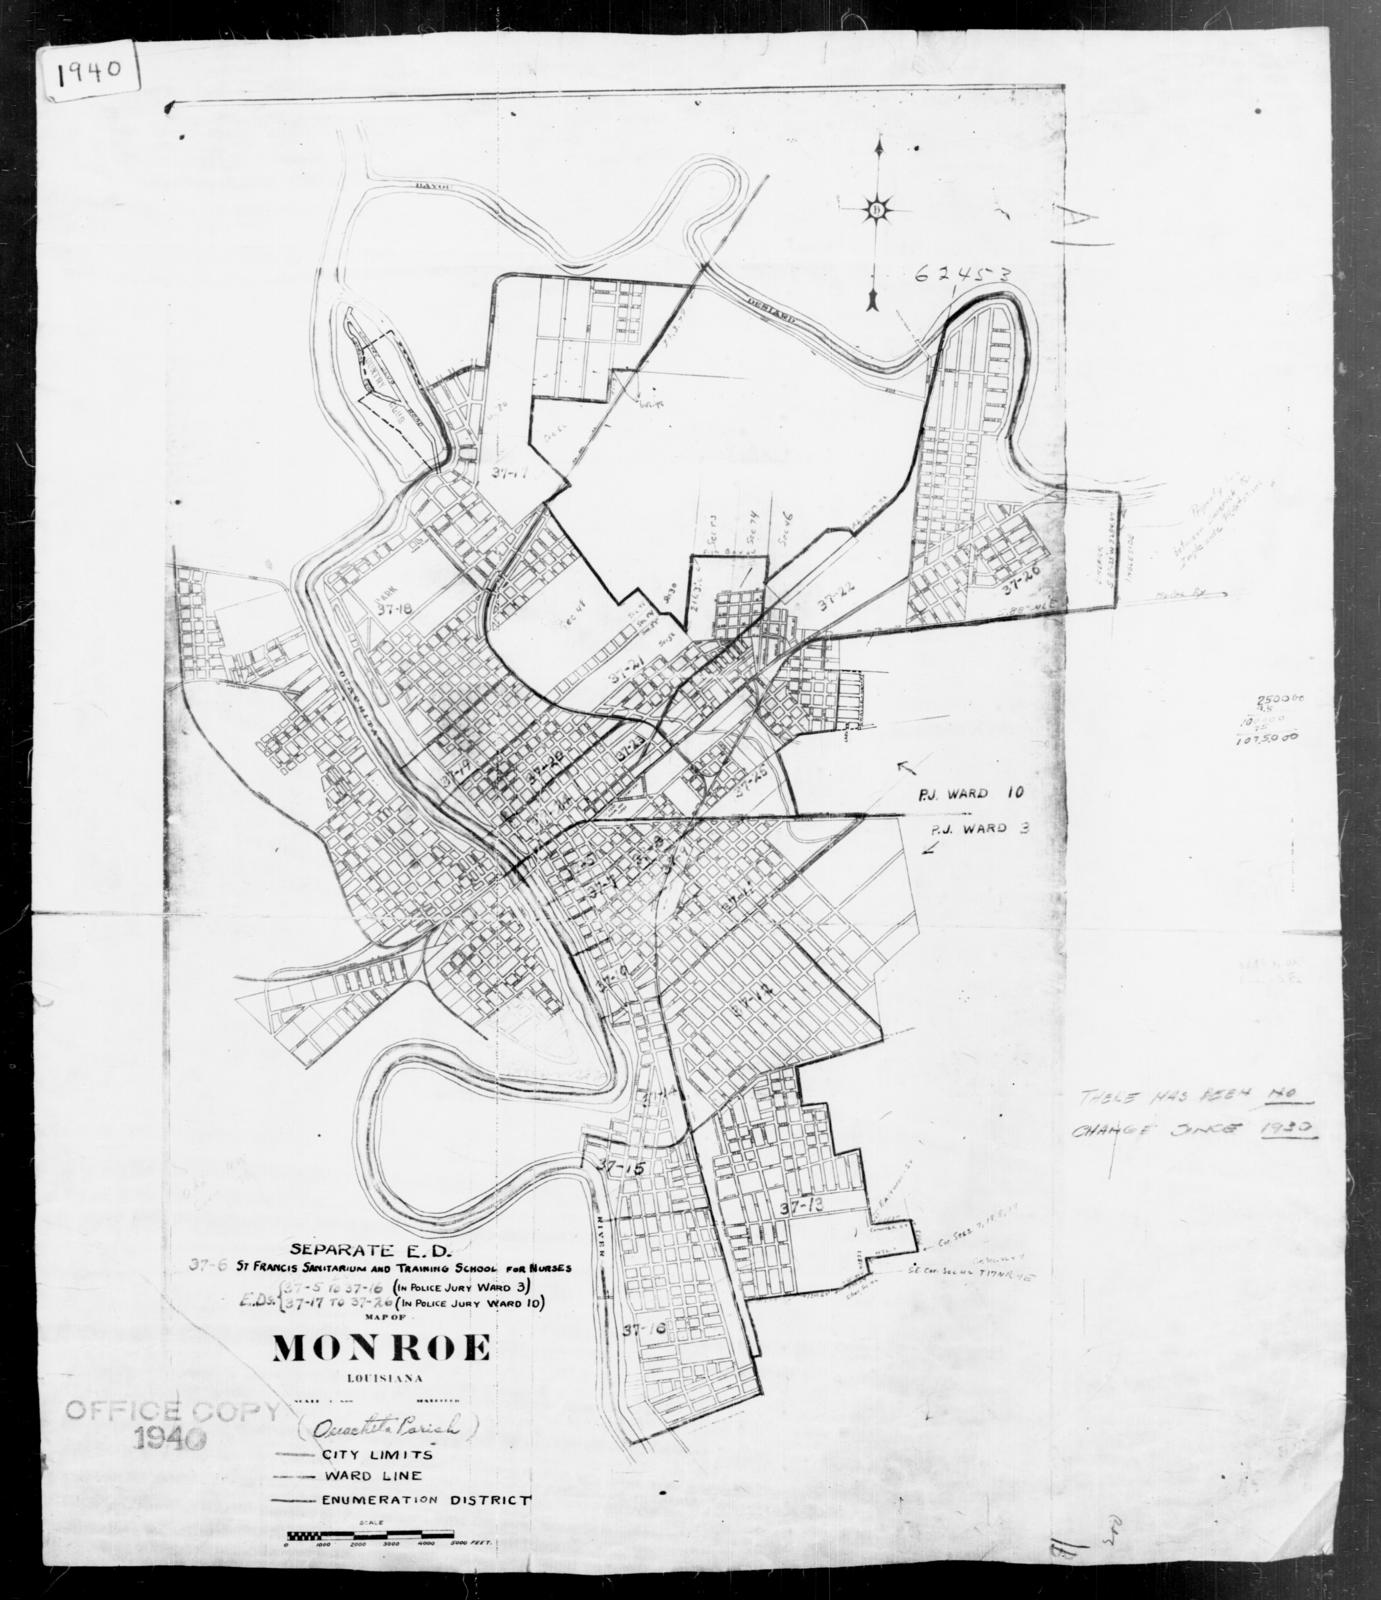 1940 Census Enumeration District Maps - Louisiana (LA) - Ouachita Parish - Monroe - ED 37-5 - ED 37-26